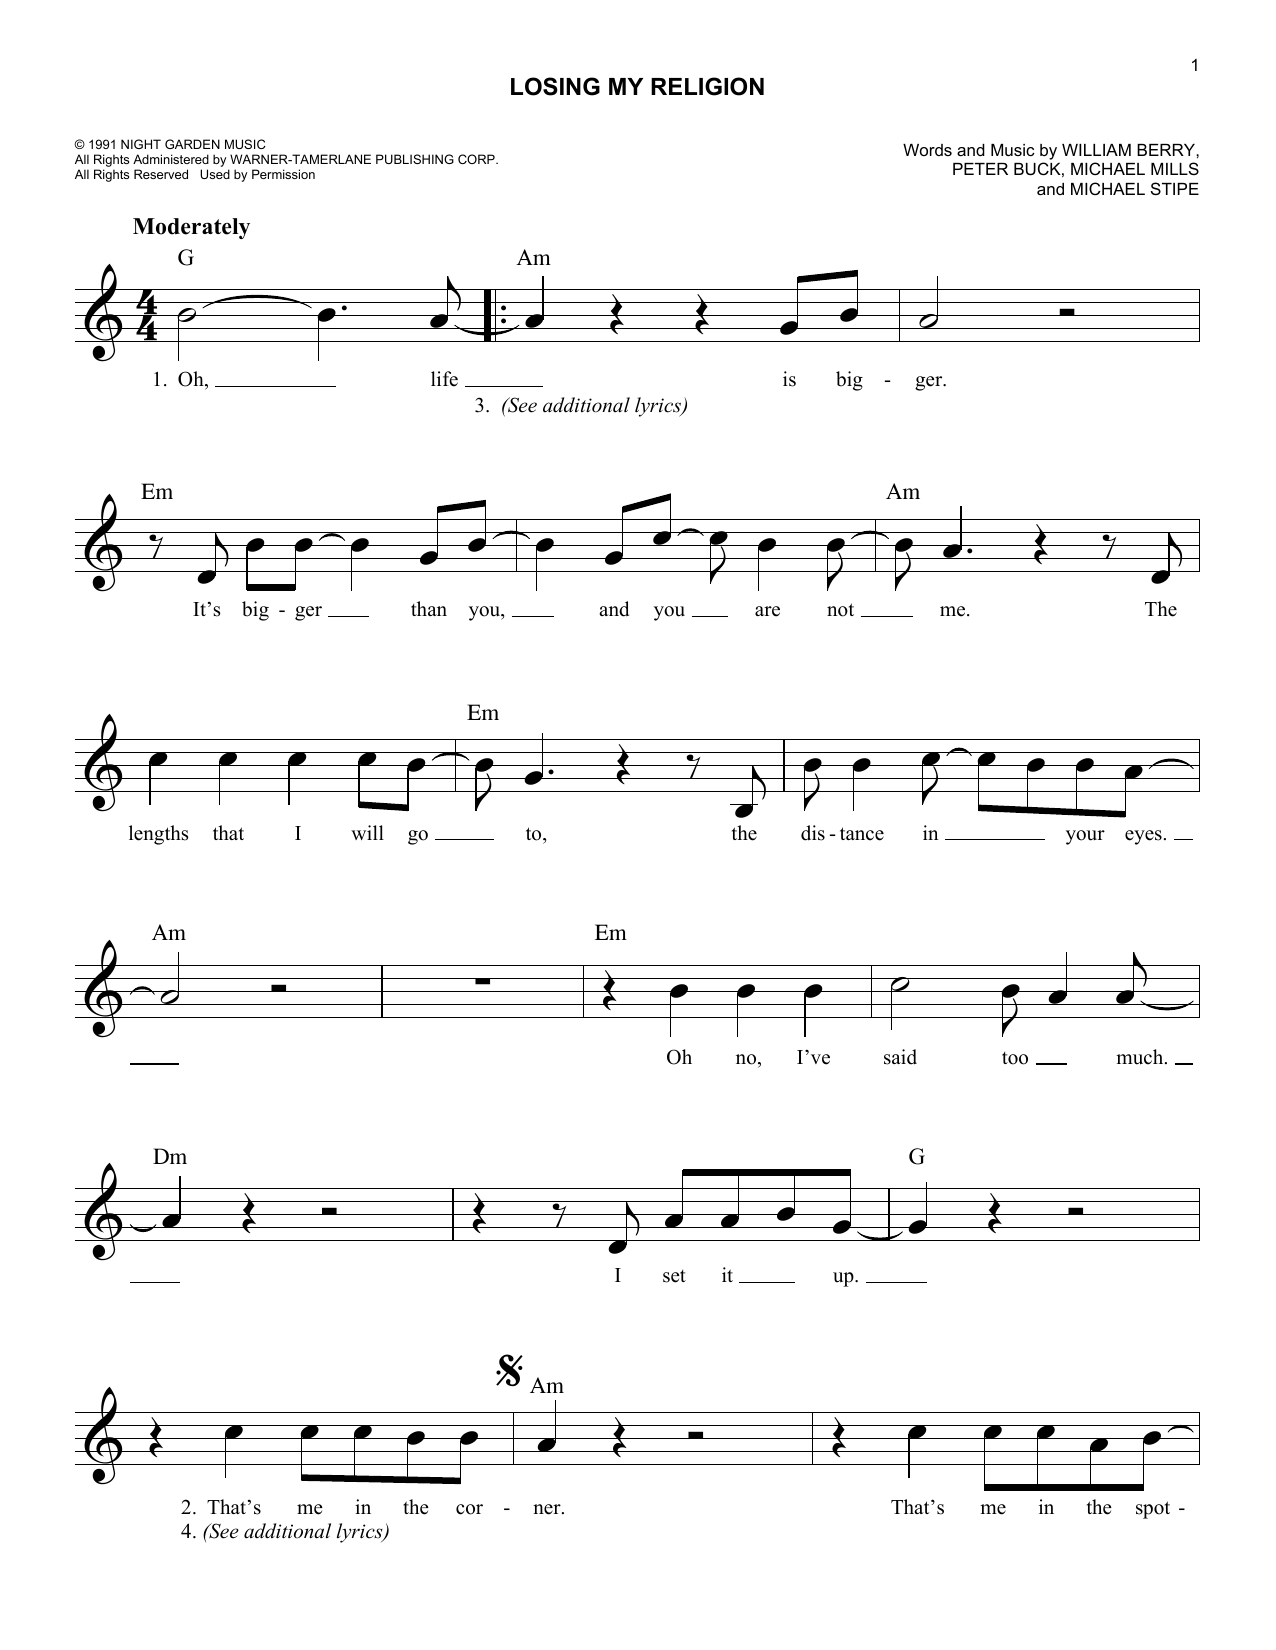 Sheet music digital files to print licensed michael stipe losing my religion hexwebz Images